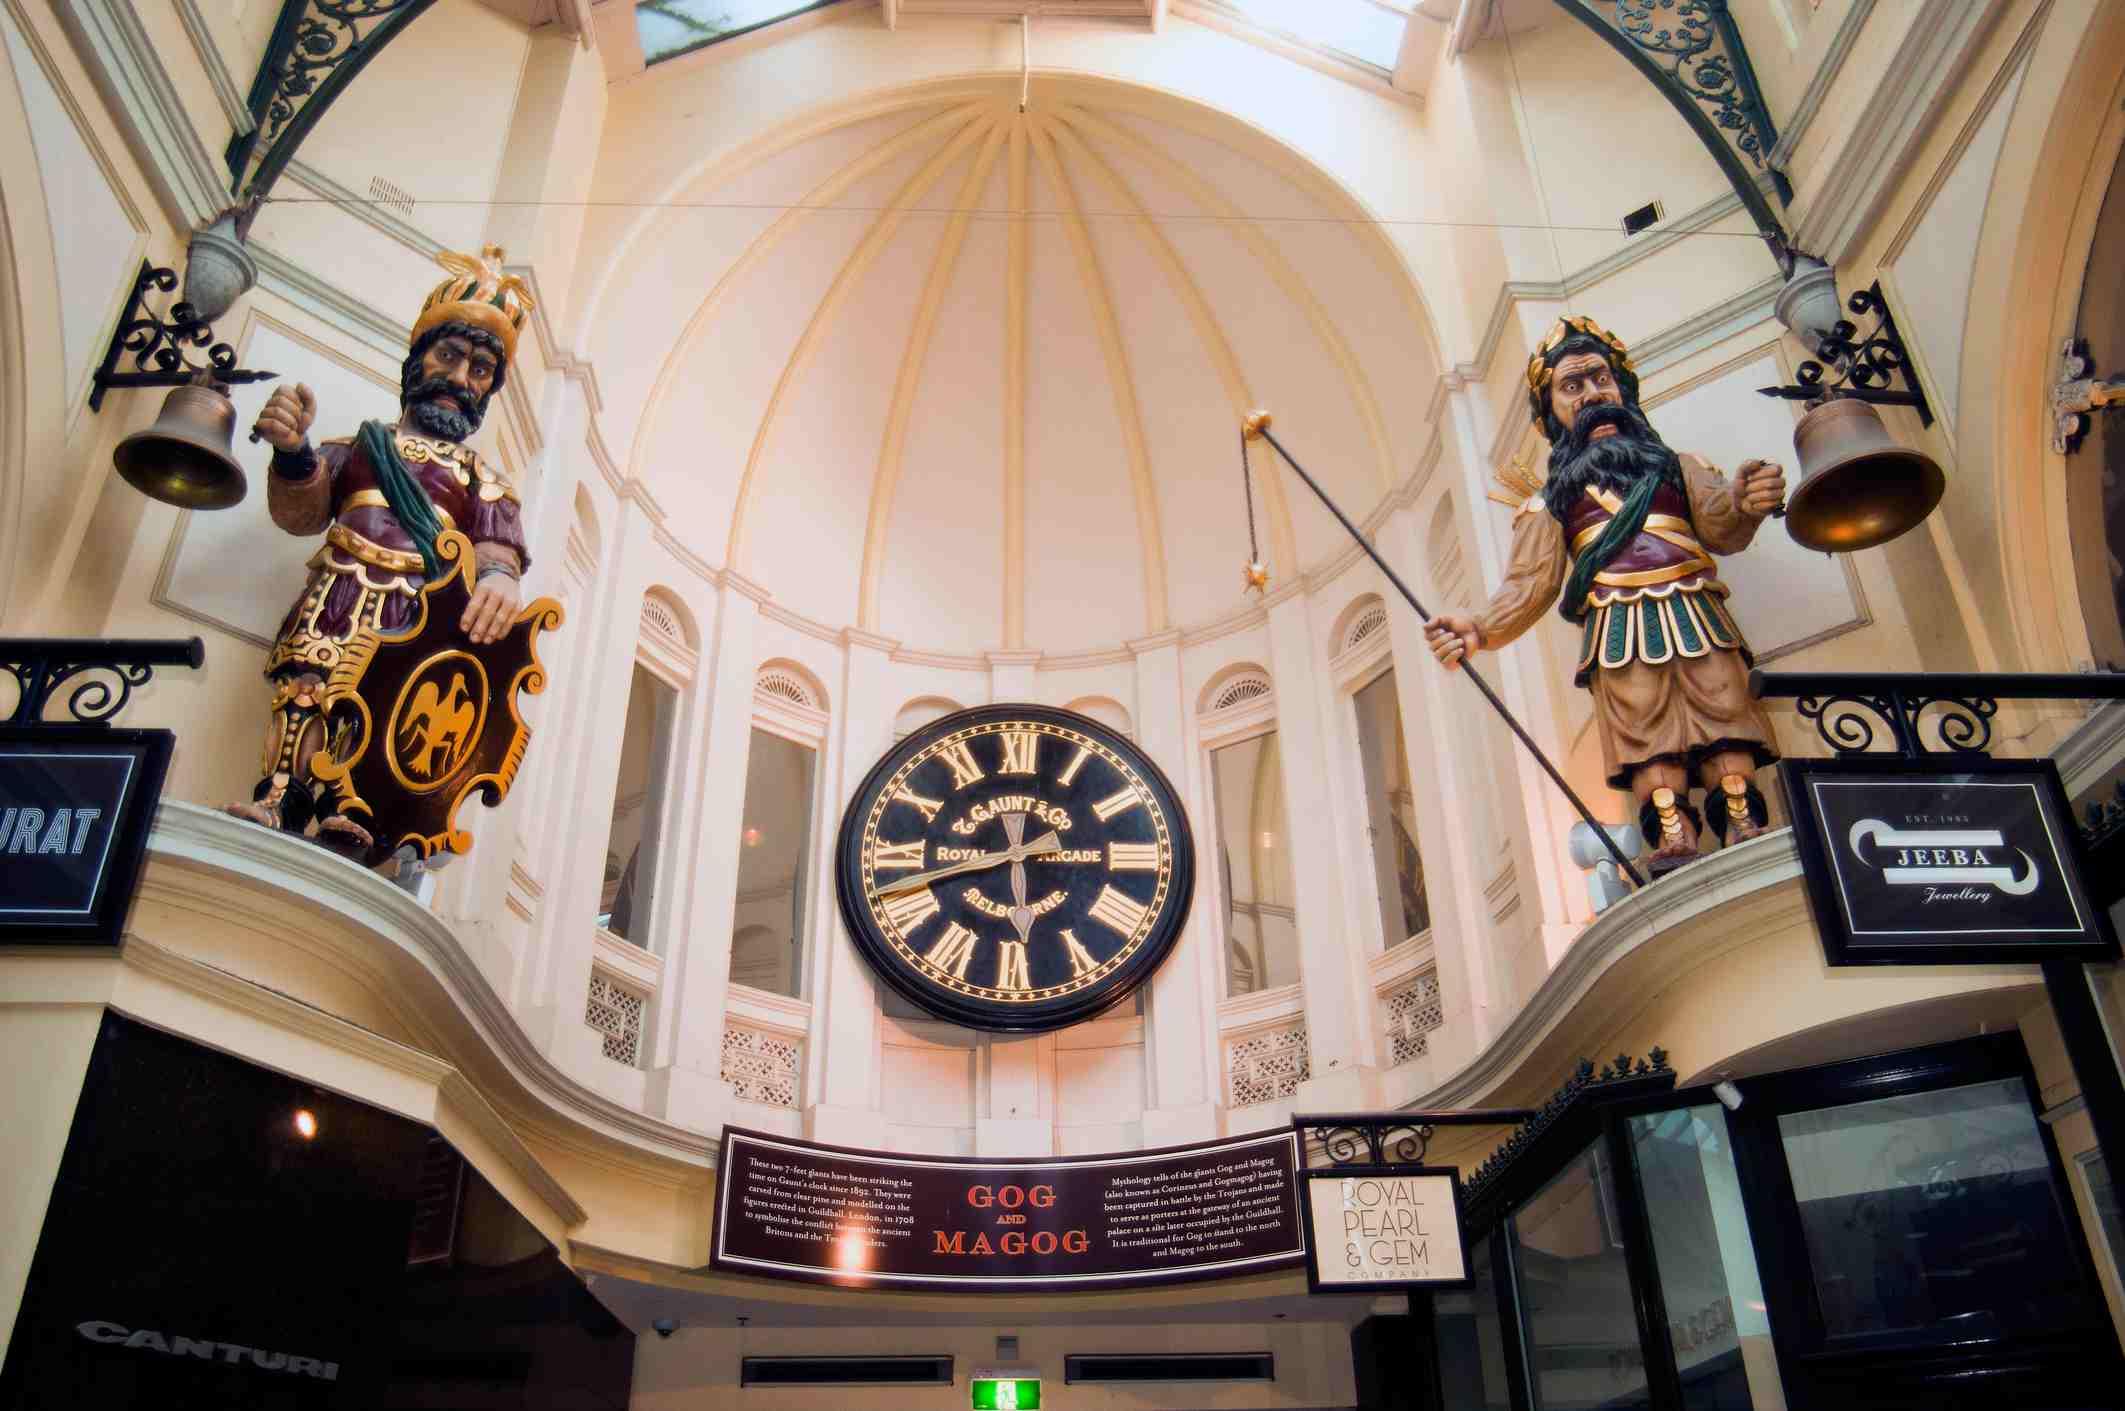 Royale Arcade in Melbourne